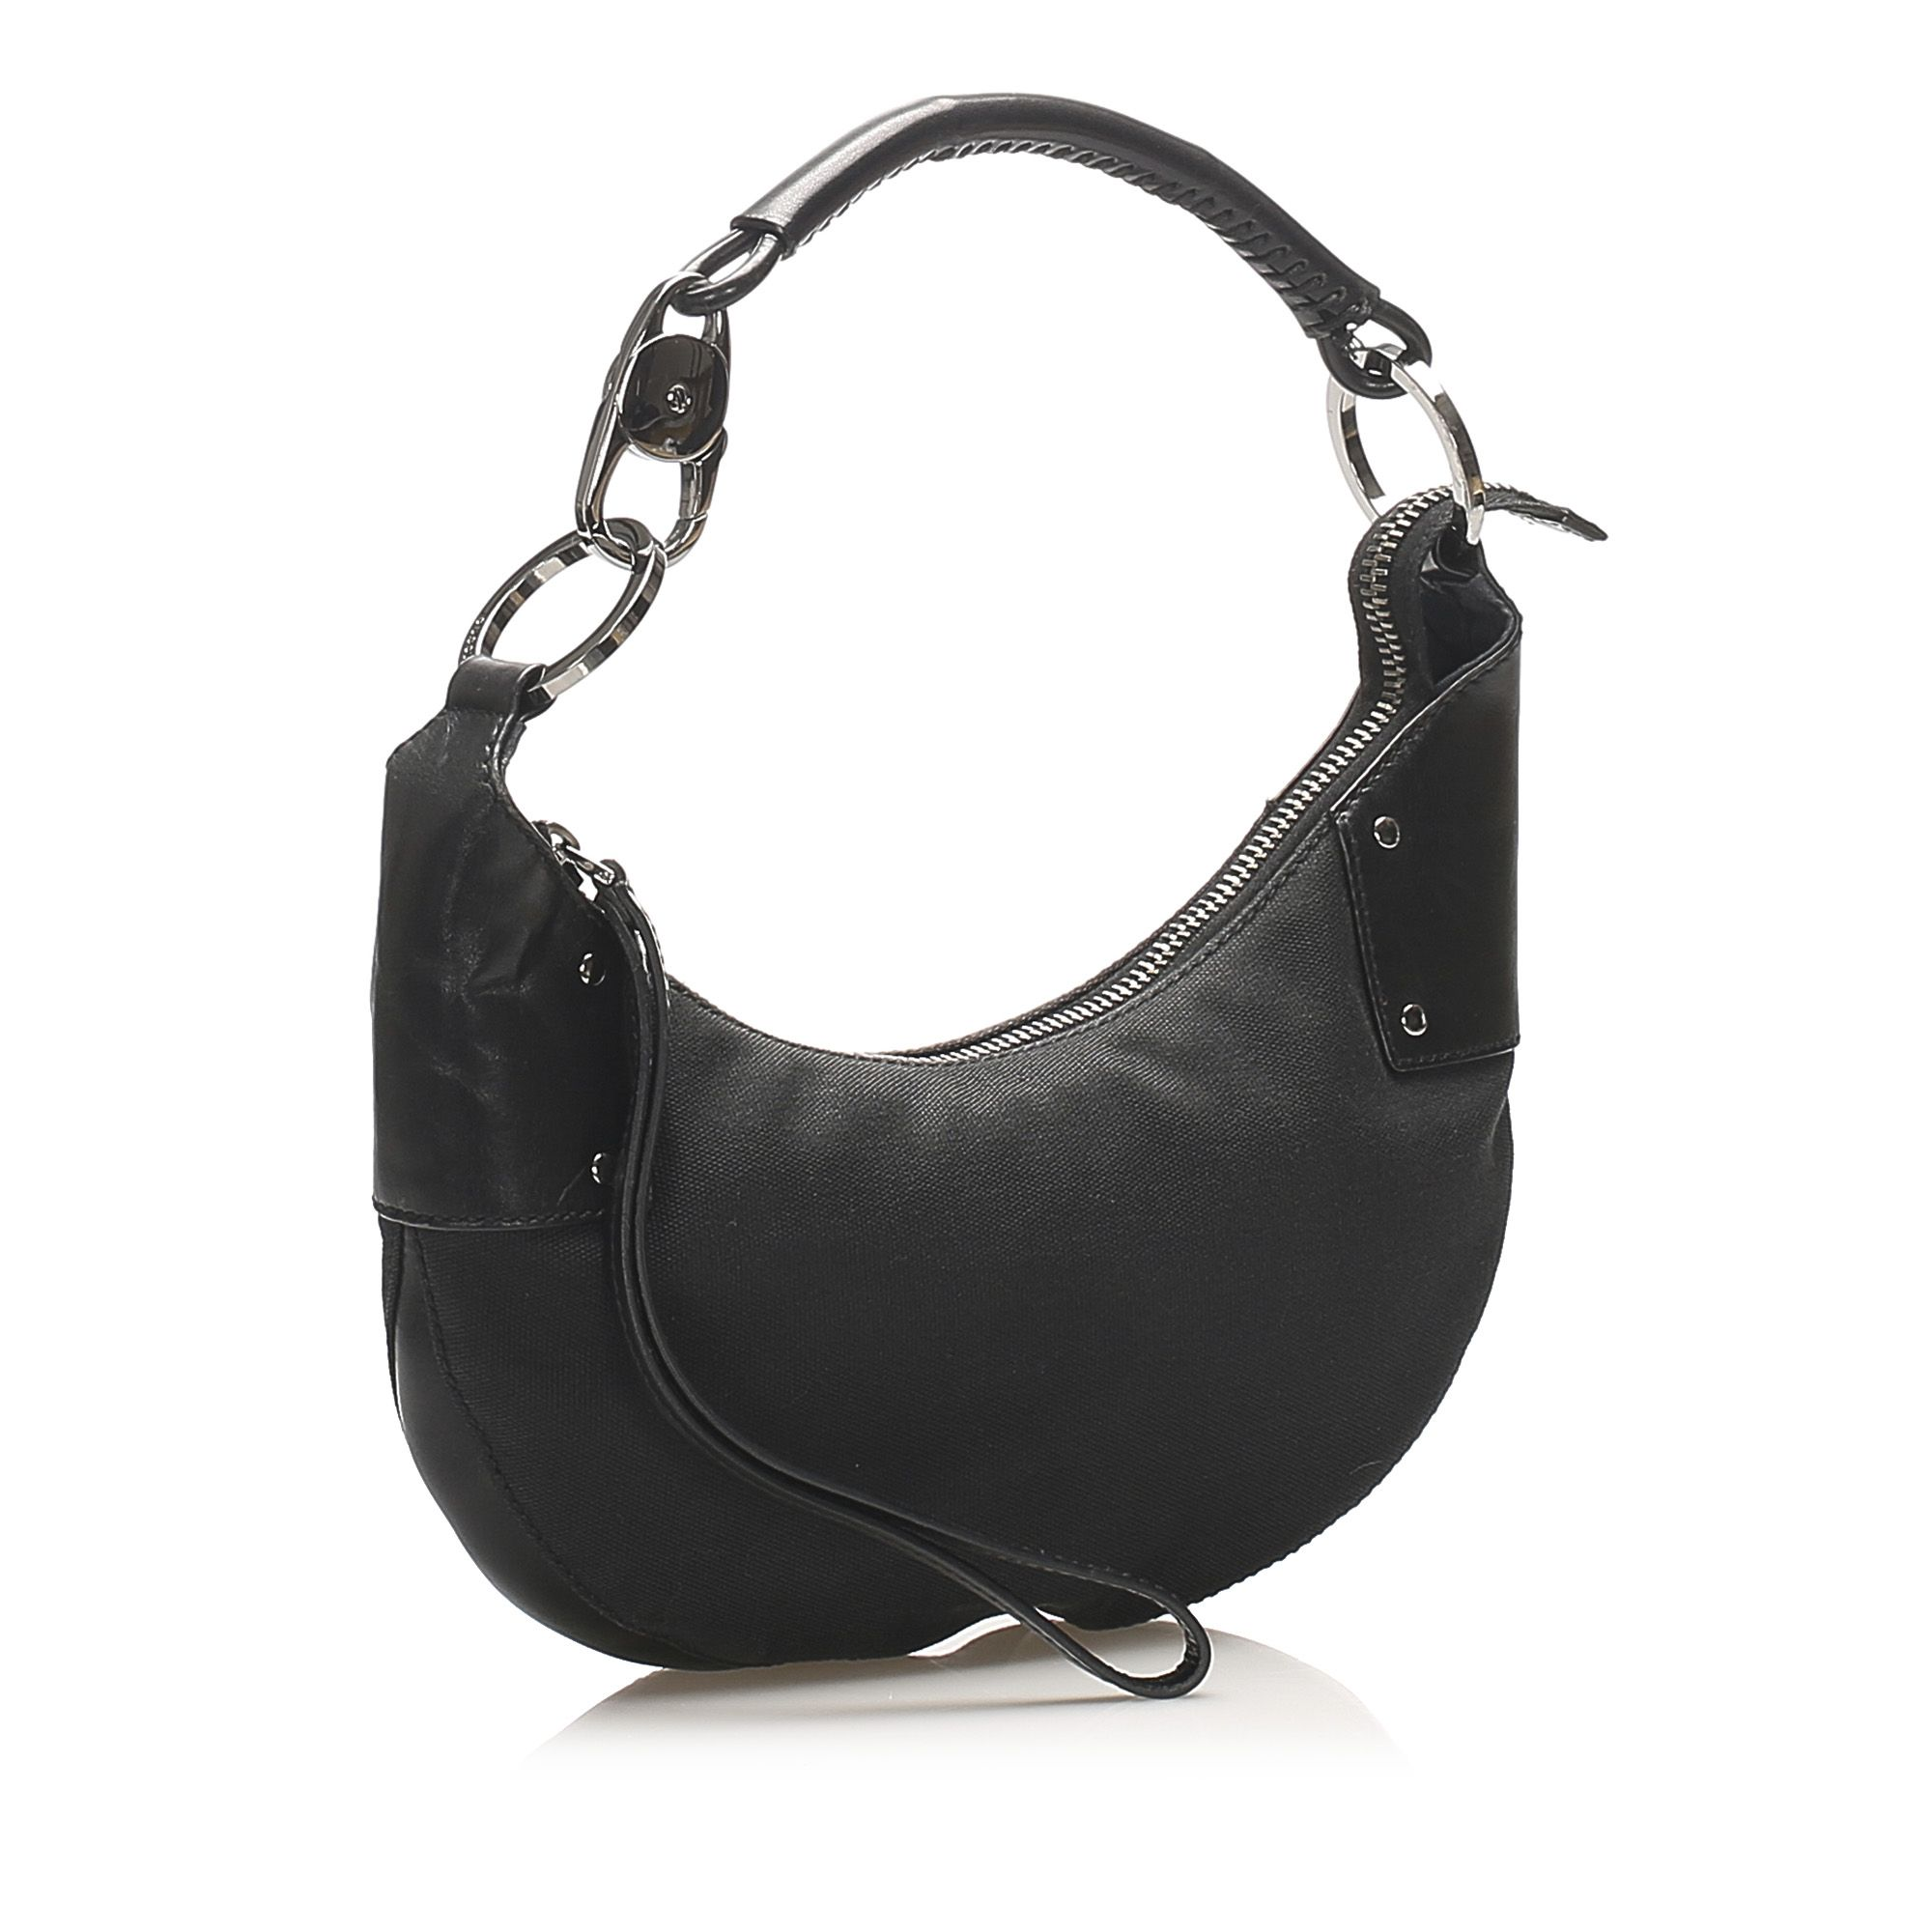 Vintage Gucci Canvas Hobo Bag Black